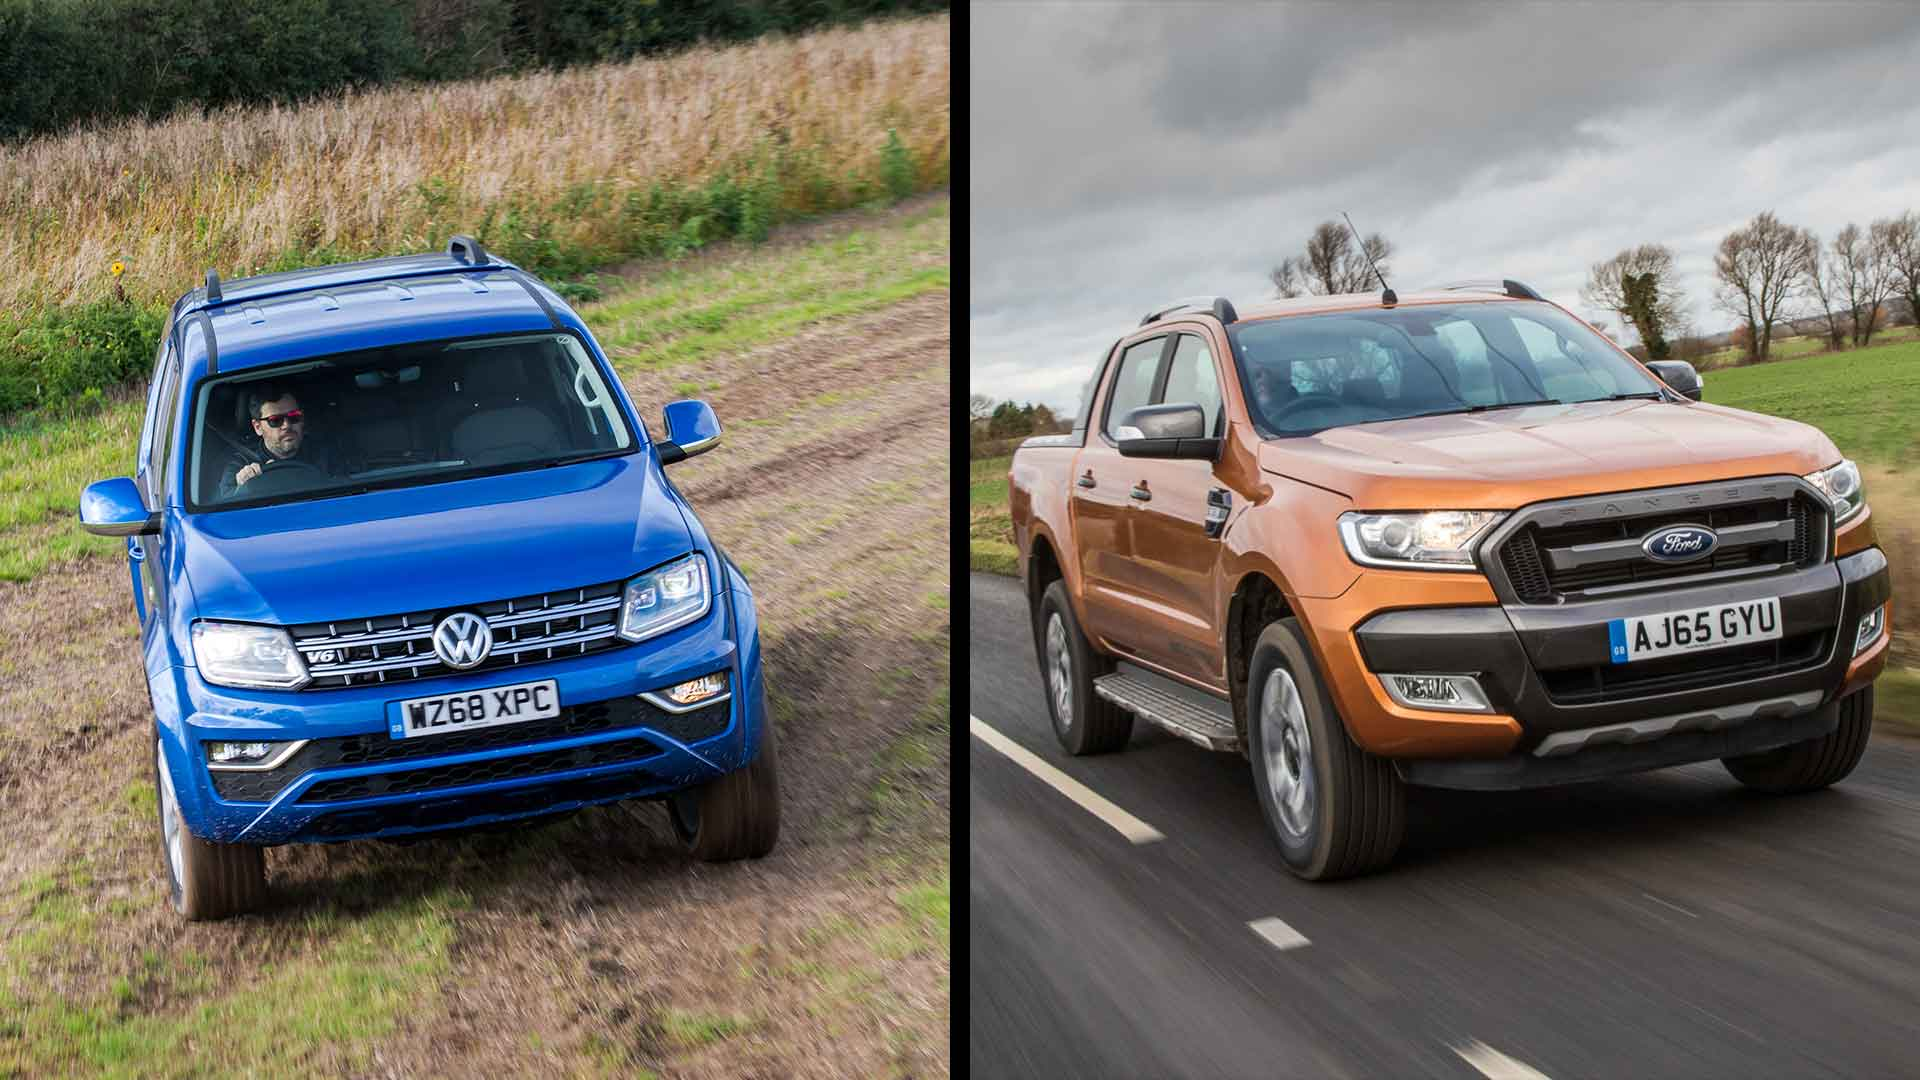 Ford And Volkswagen To Build Pick-ups, Vans Together